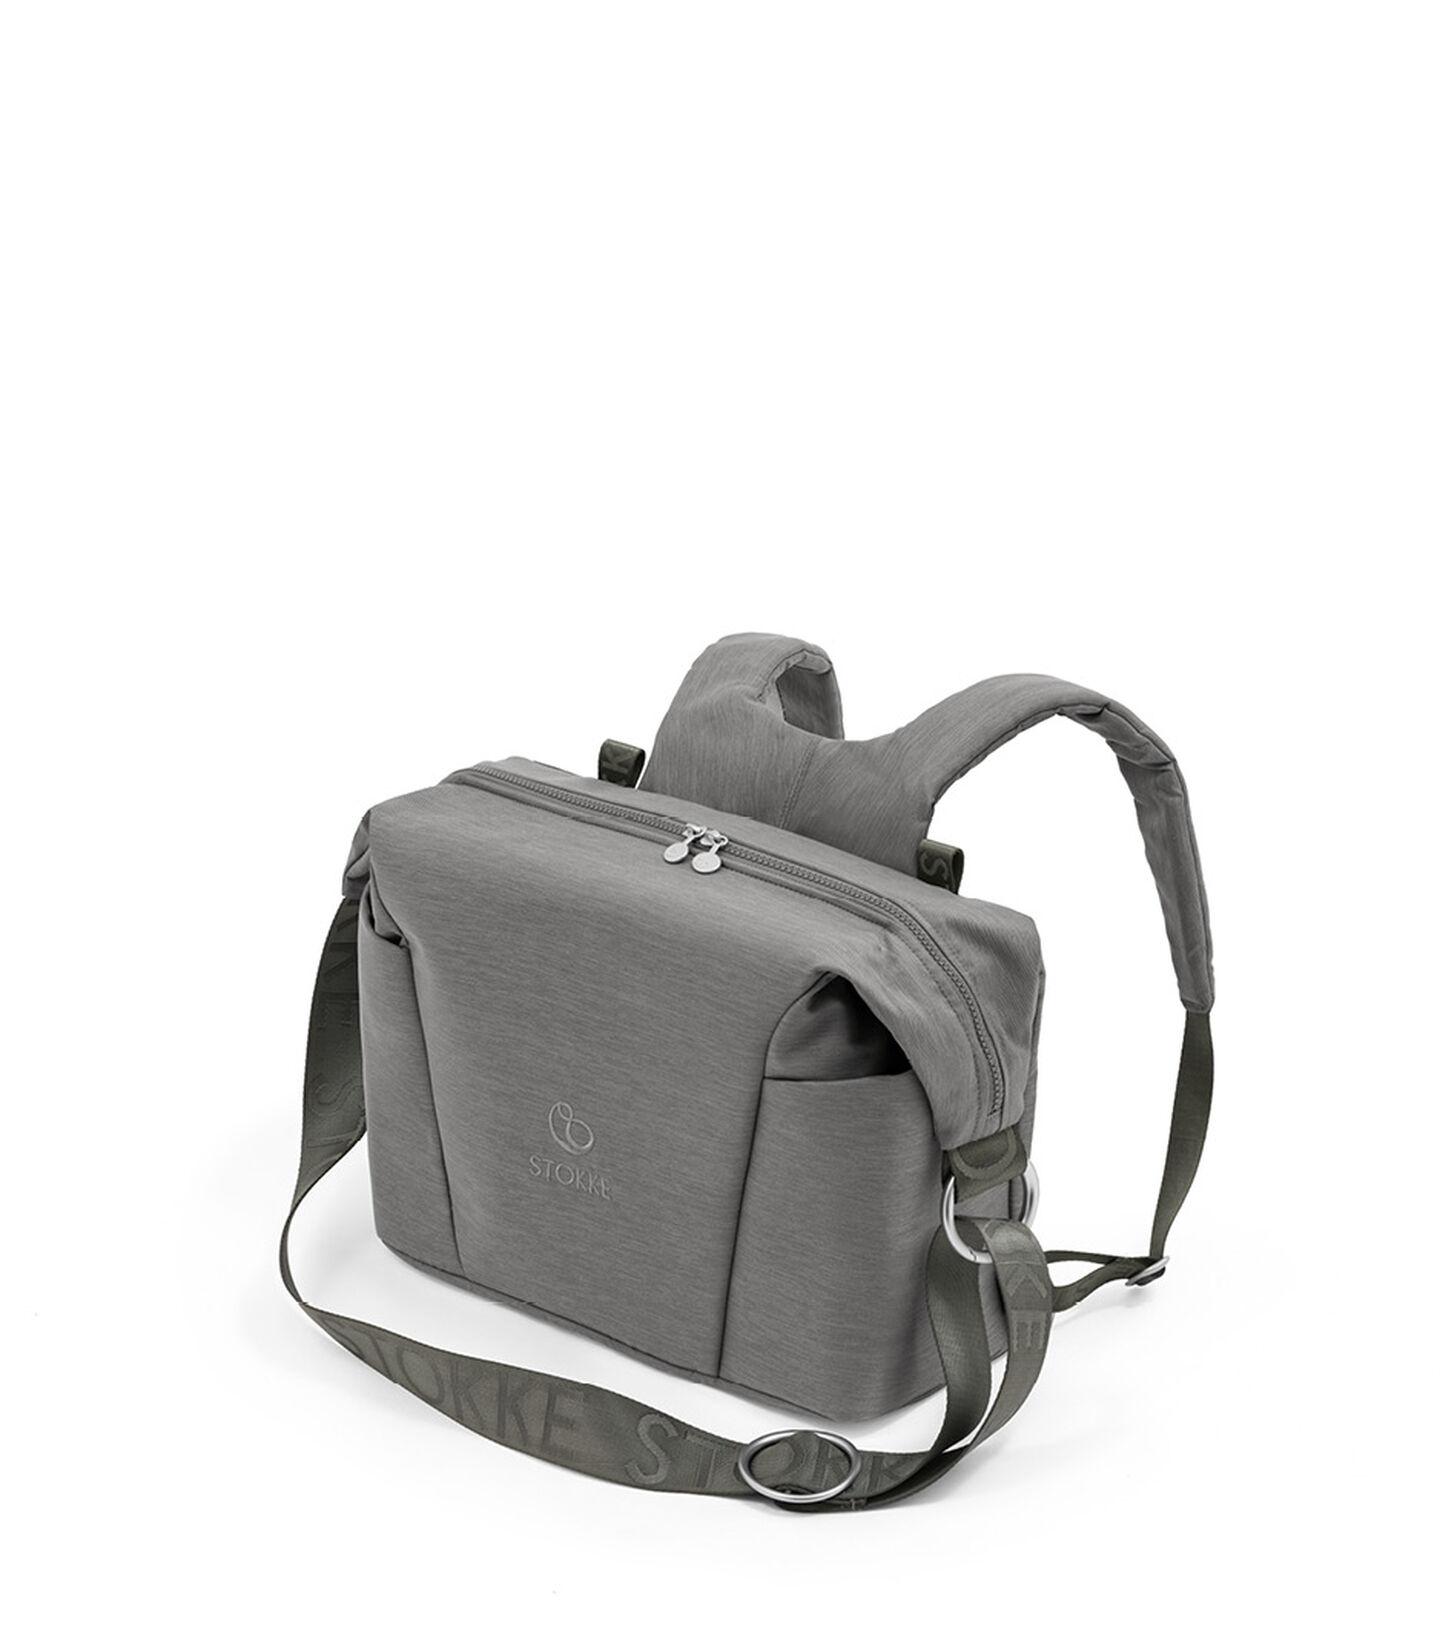 Stokke® Xplory® X verzorgingstas Modern Grey, Modern Grey, mainview view 1